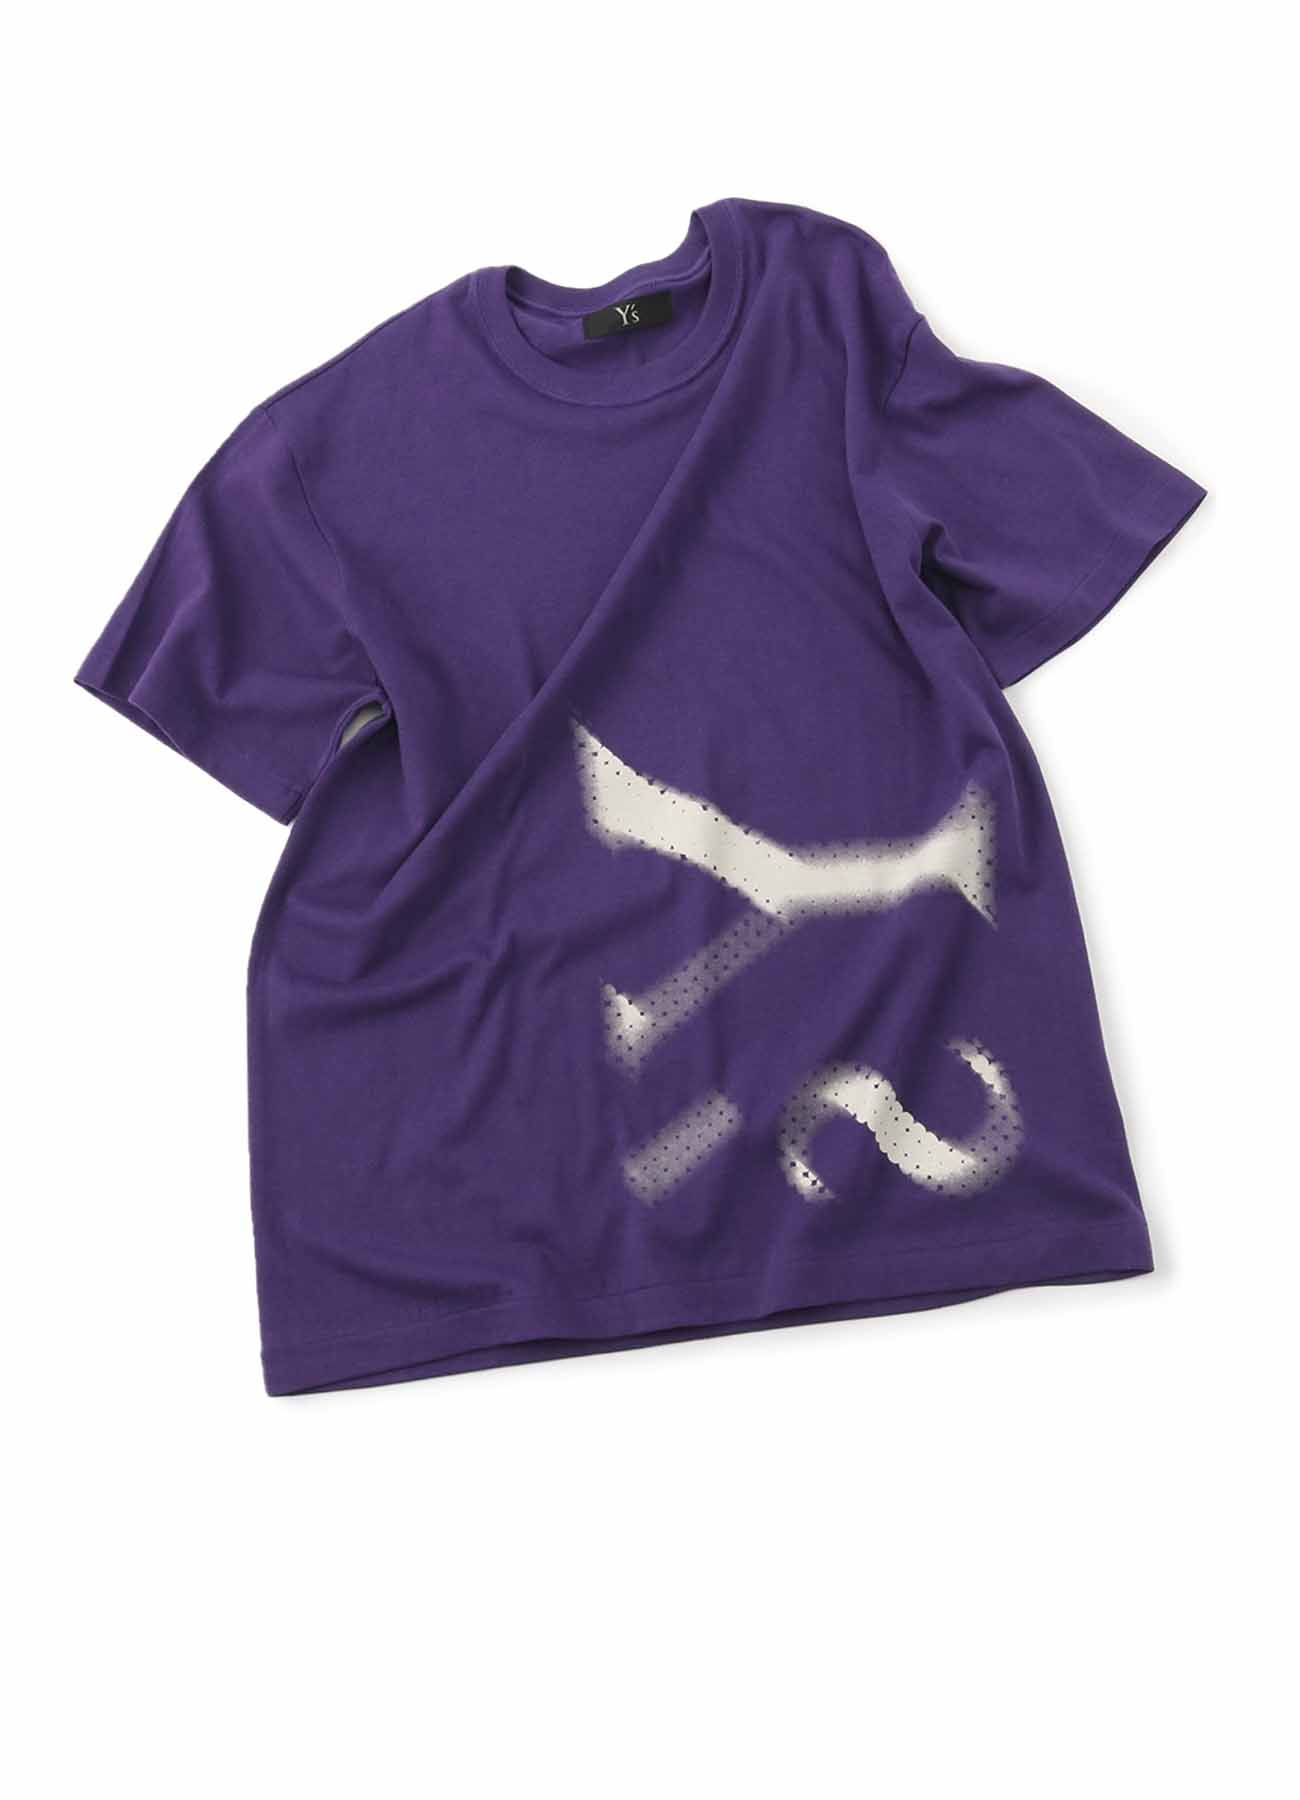 -Online EXCLUSIVE- Y's logo T-shirt